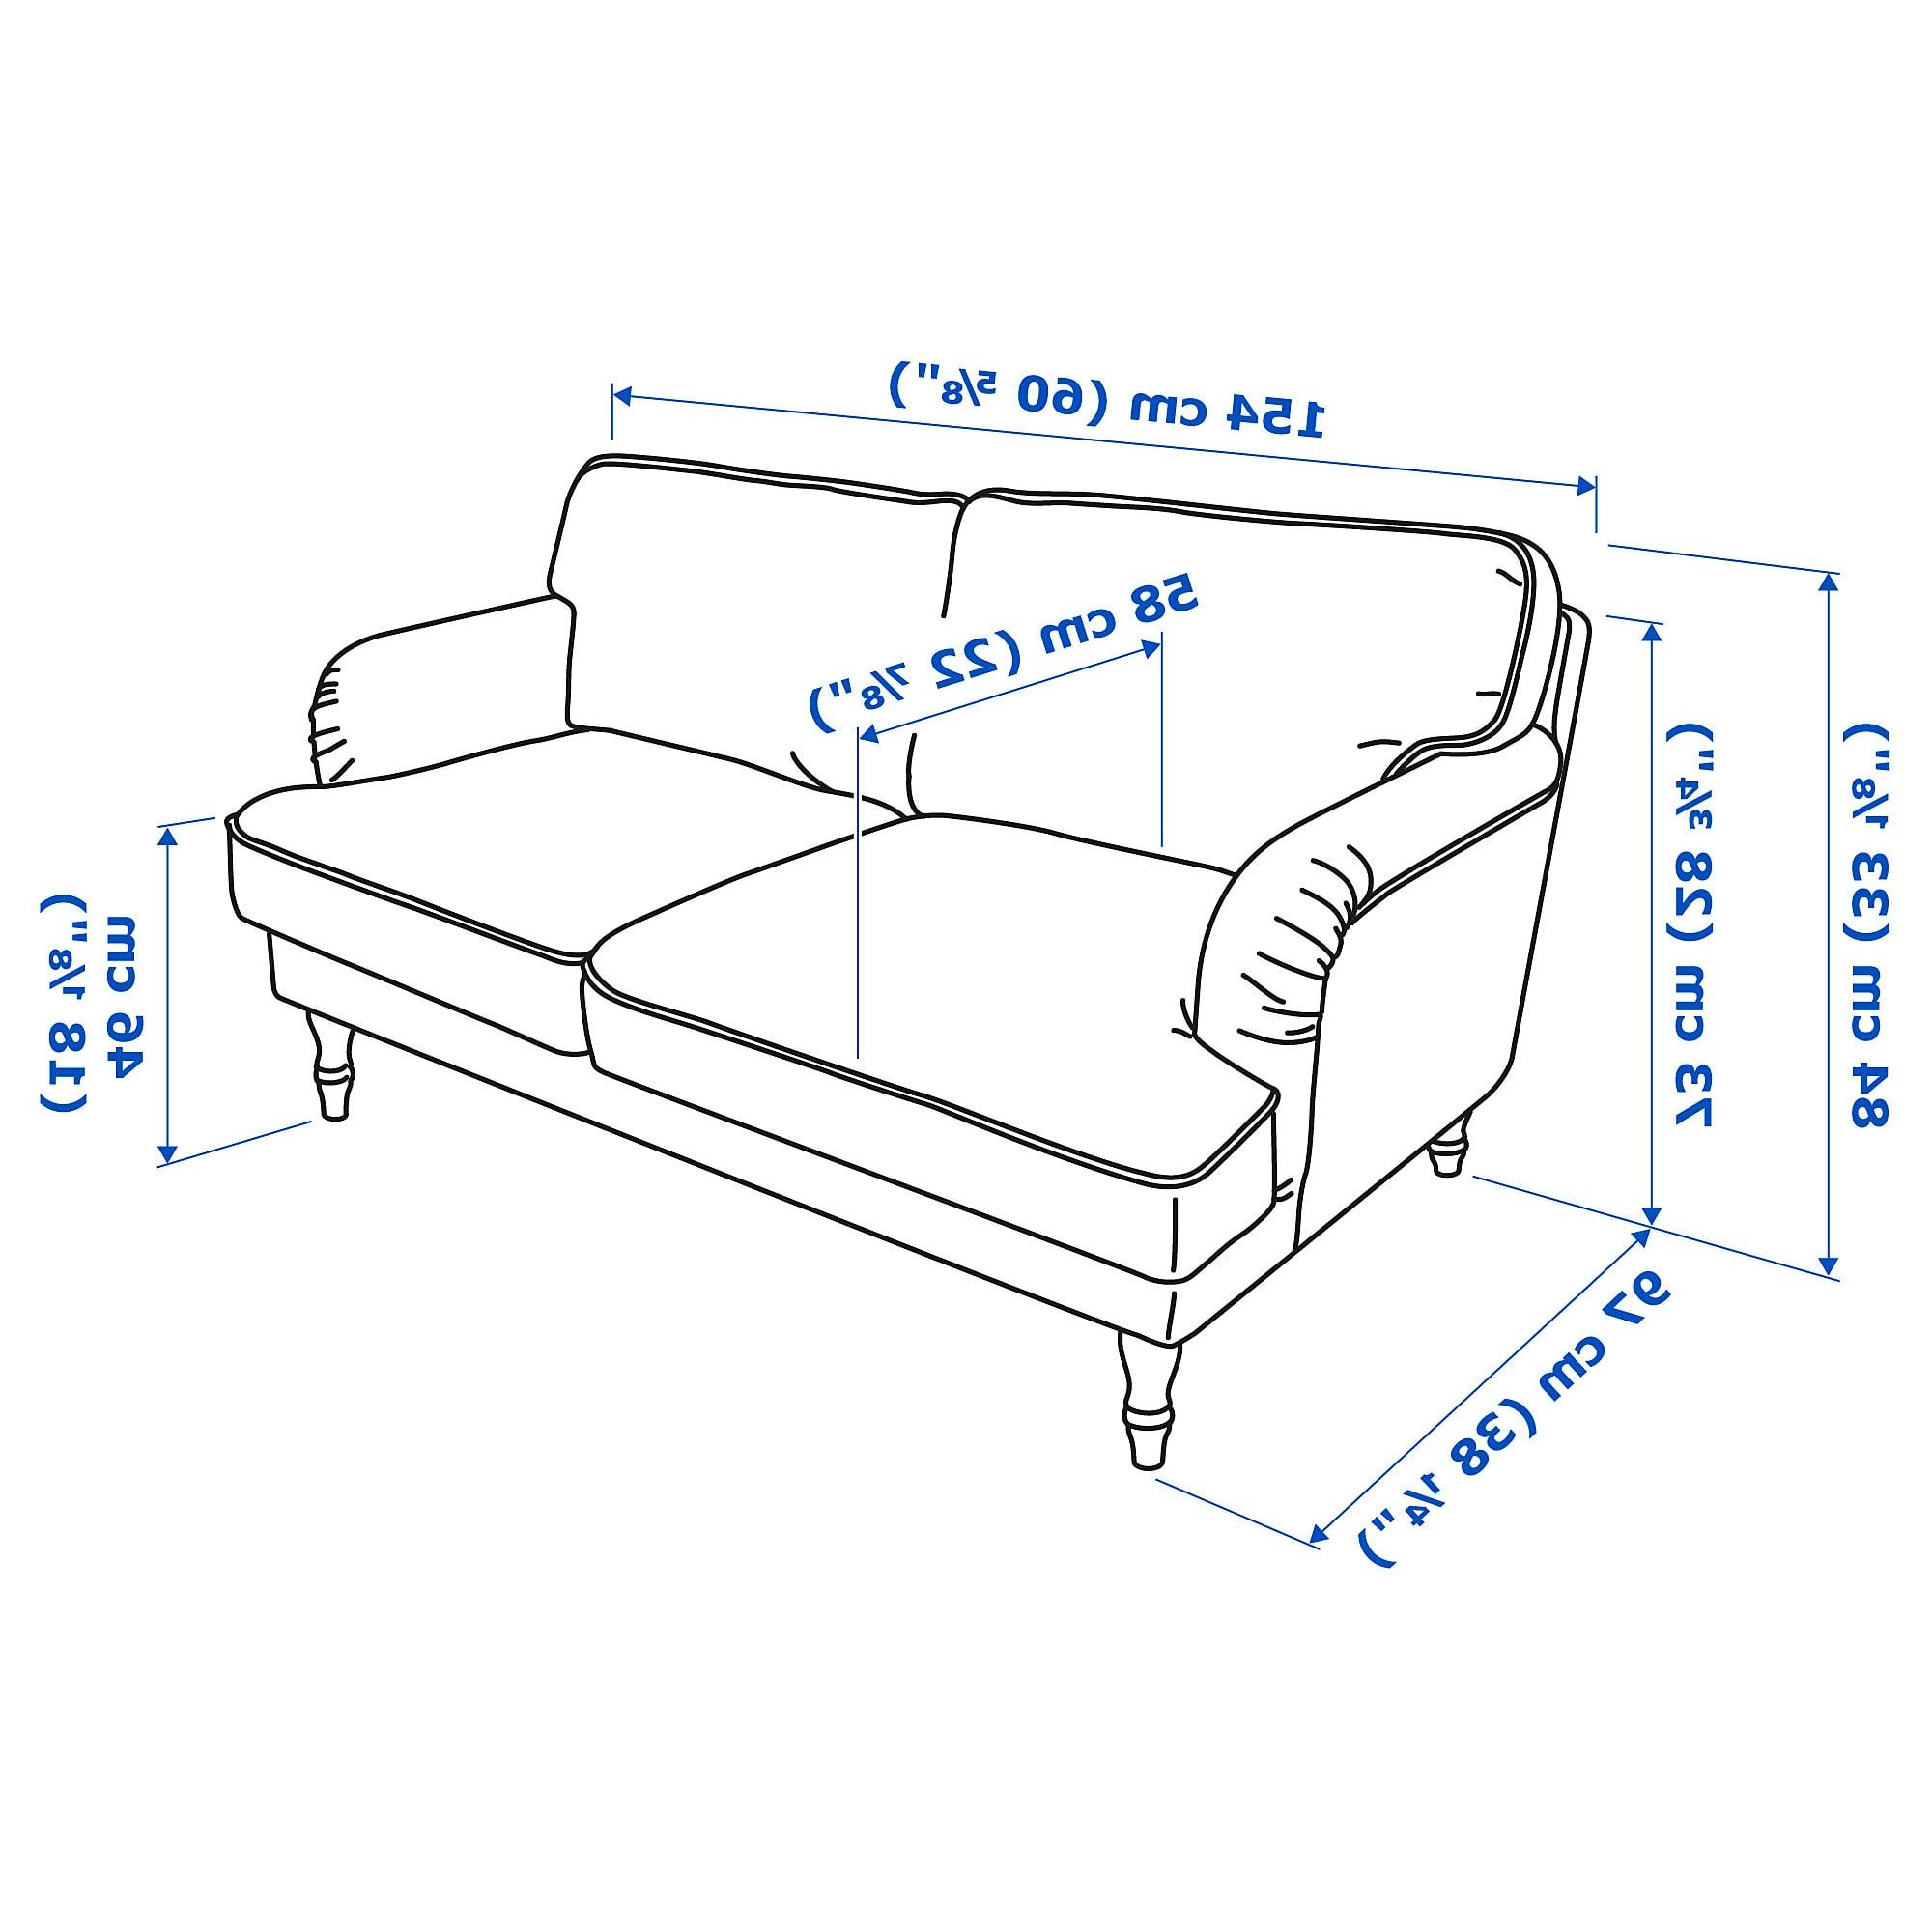 Medidas sofa 2 Plazas Txdf Stocksund sofà 2 Plazas Ljungen Azul Negro Madera Ikea